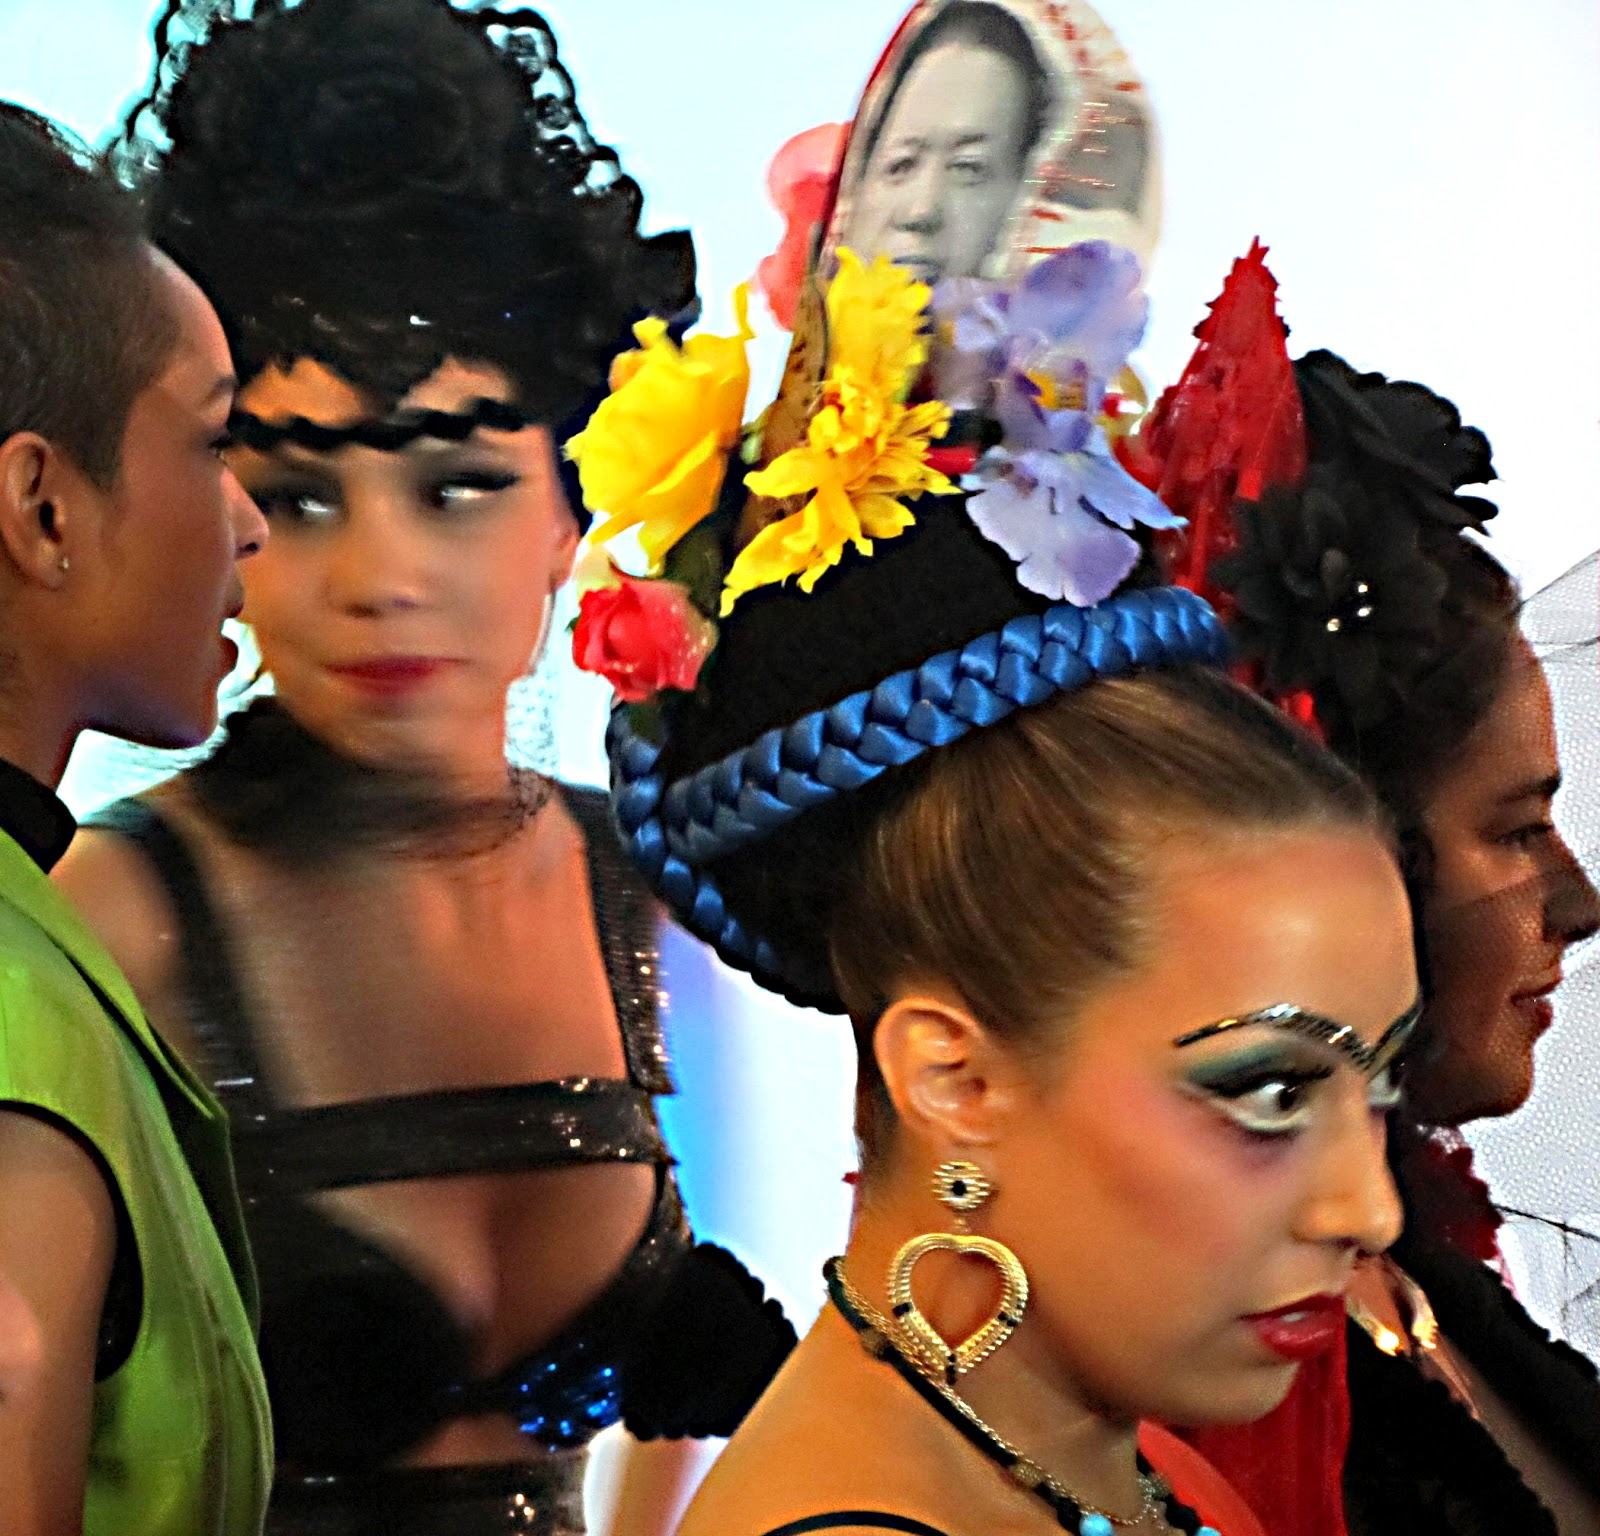 ... estudio 2 dancers 2012 estudio 2 estrella tv hannah vreeland estudio 2